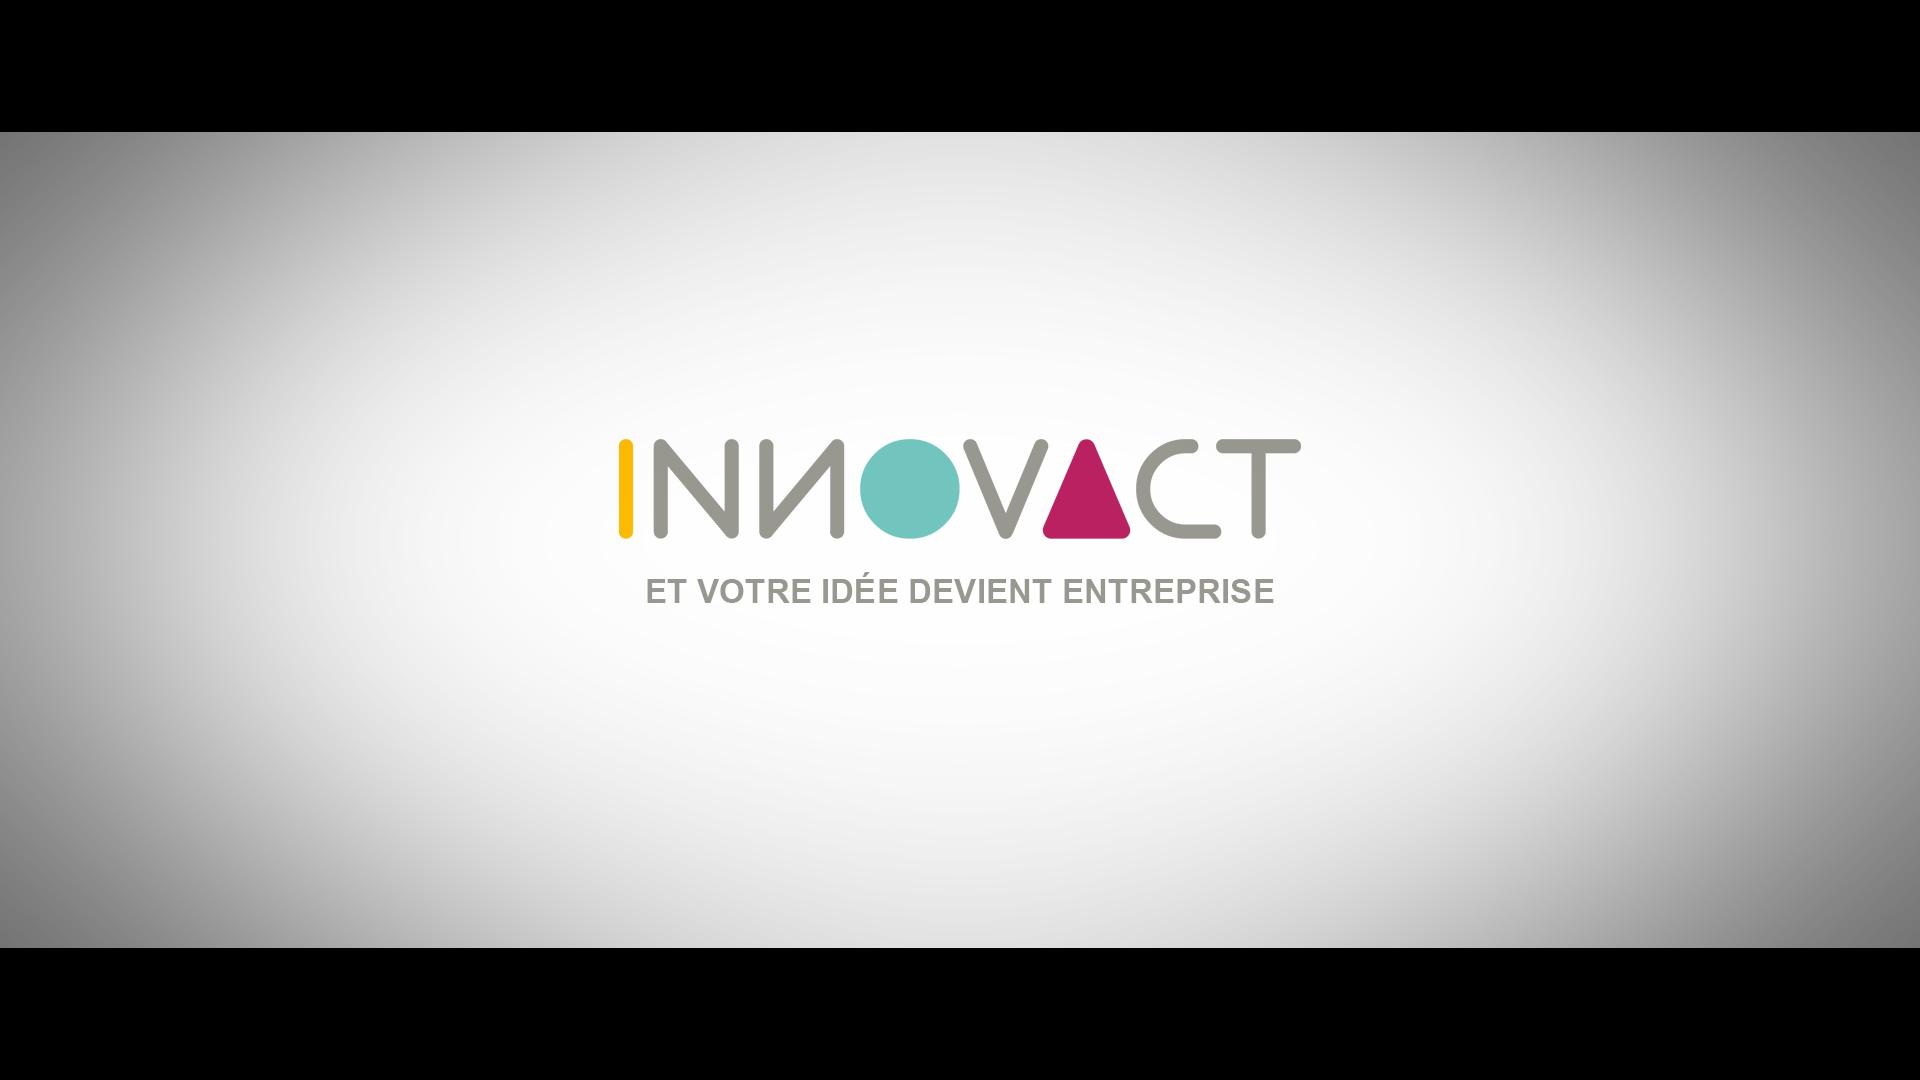 Innovact – Incubateur de start-up à Reims